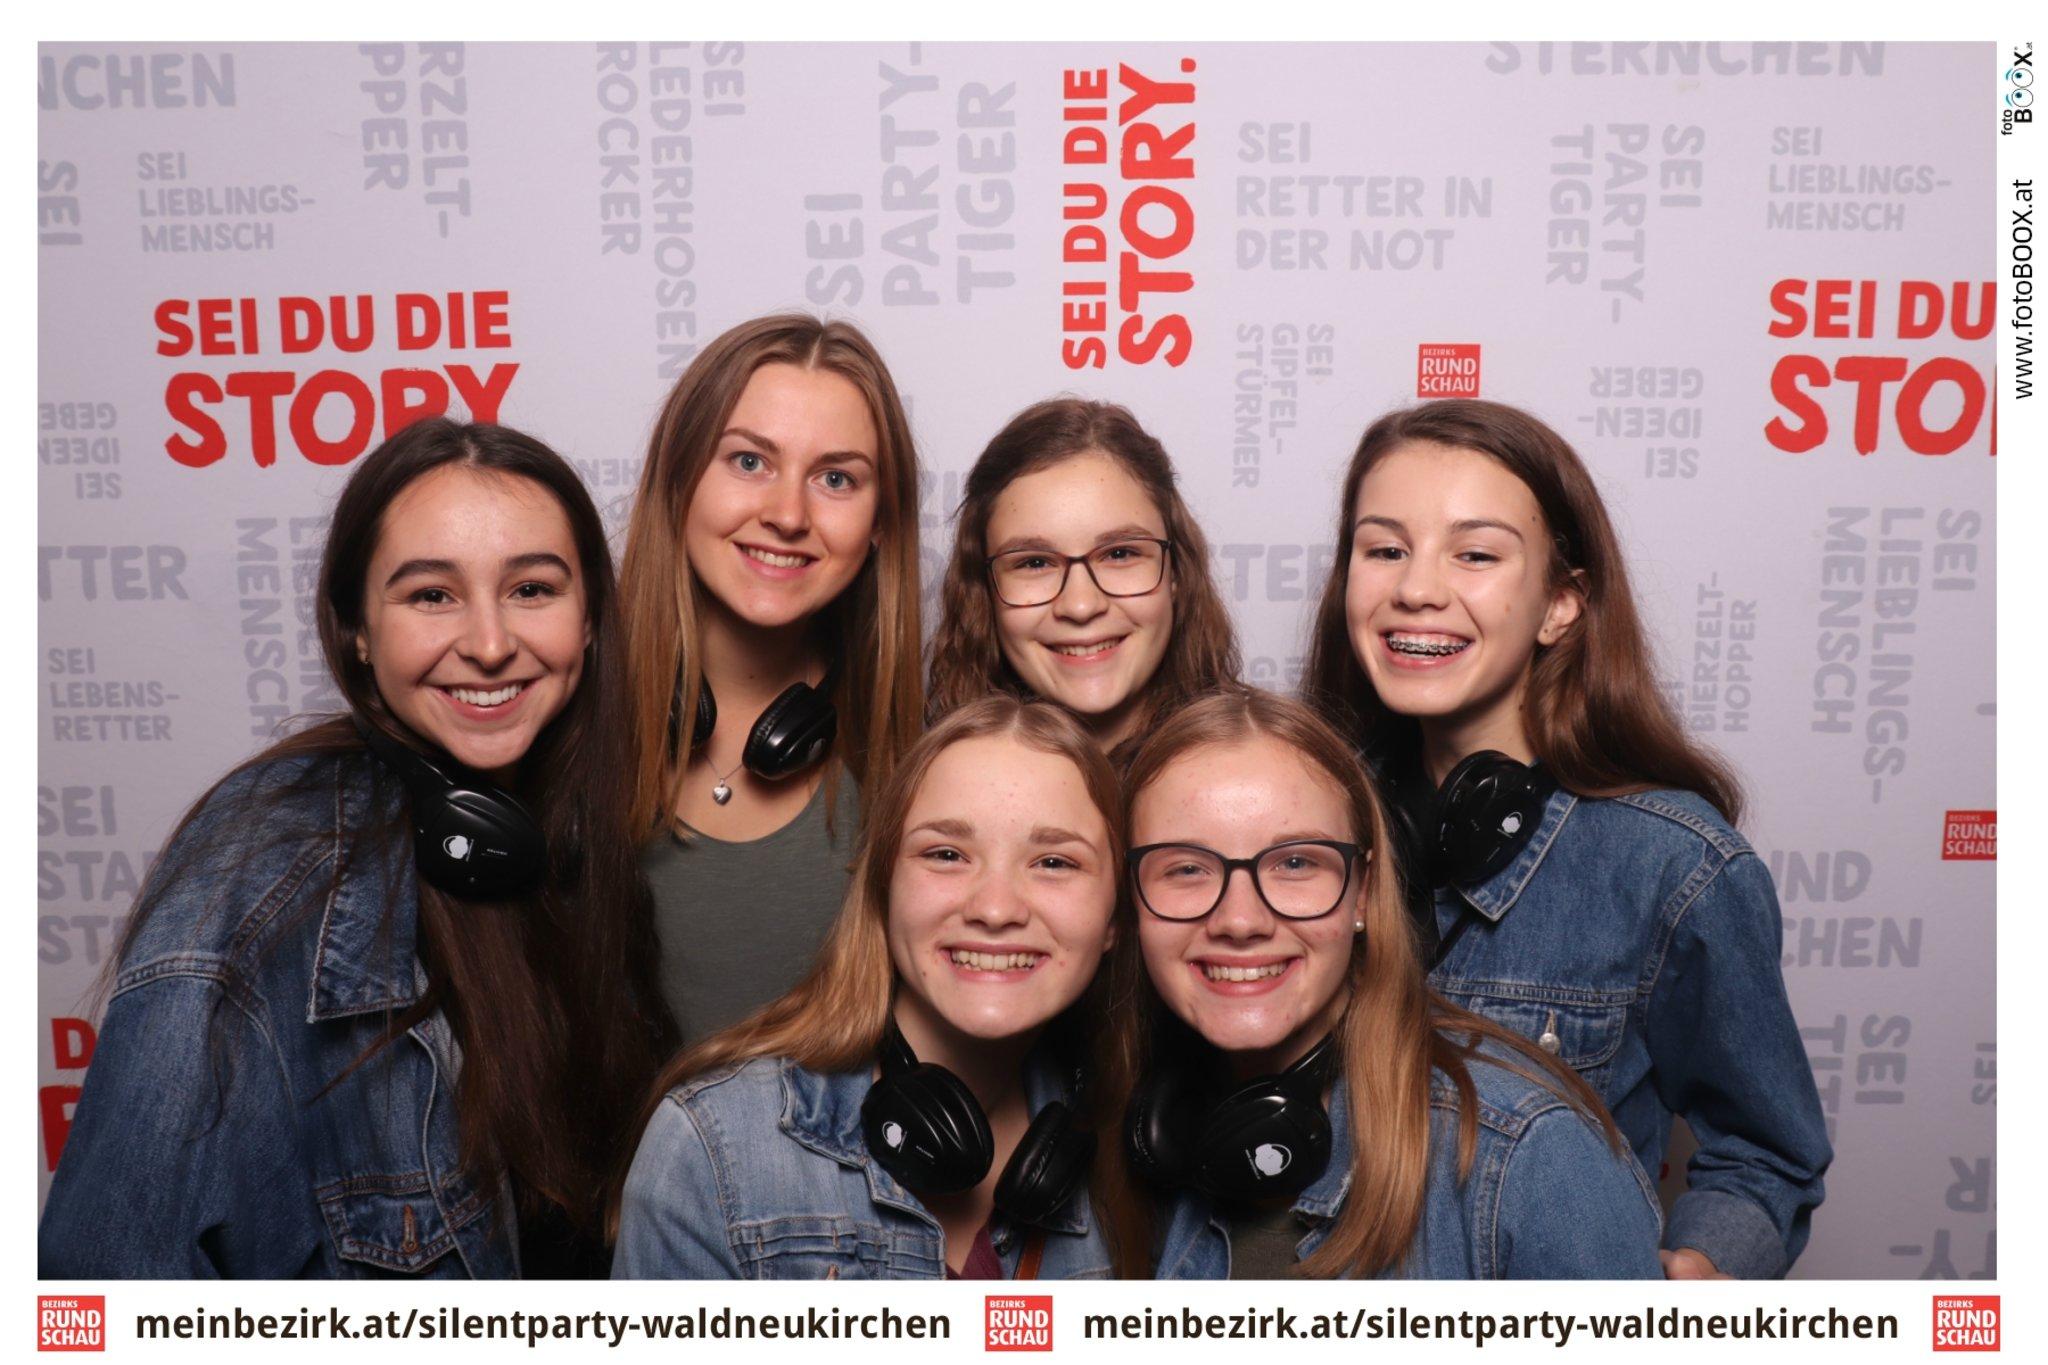 Zams mdchen kennenlernen - Kirchberg-thening dating service